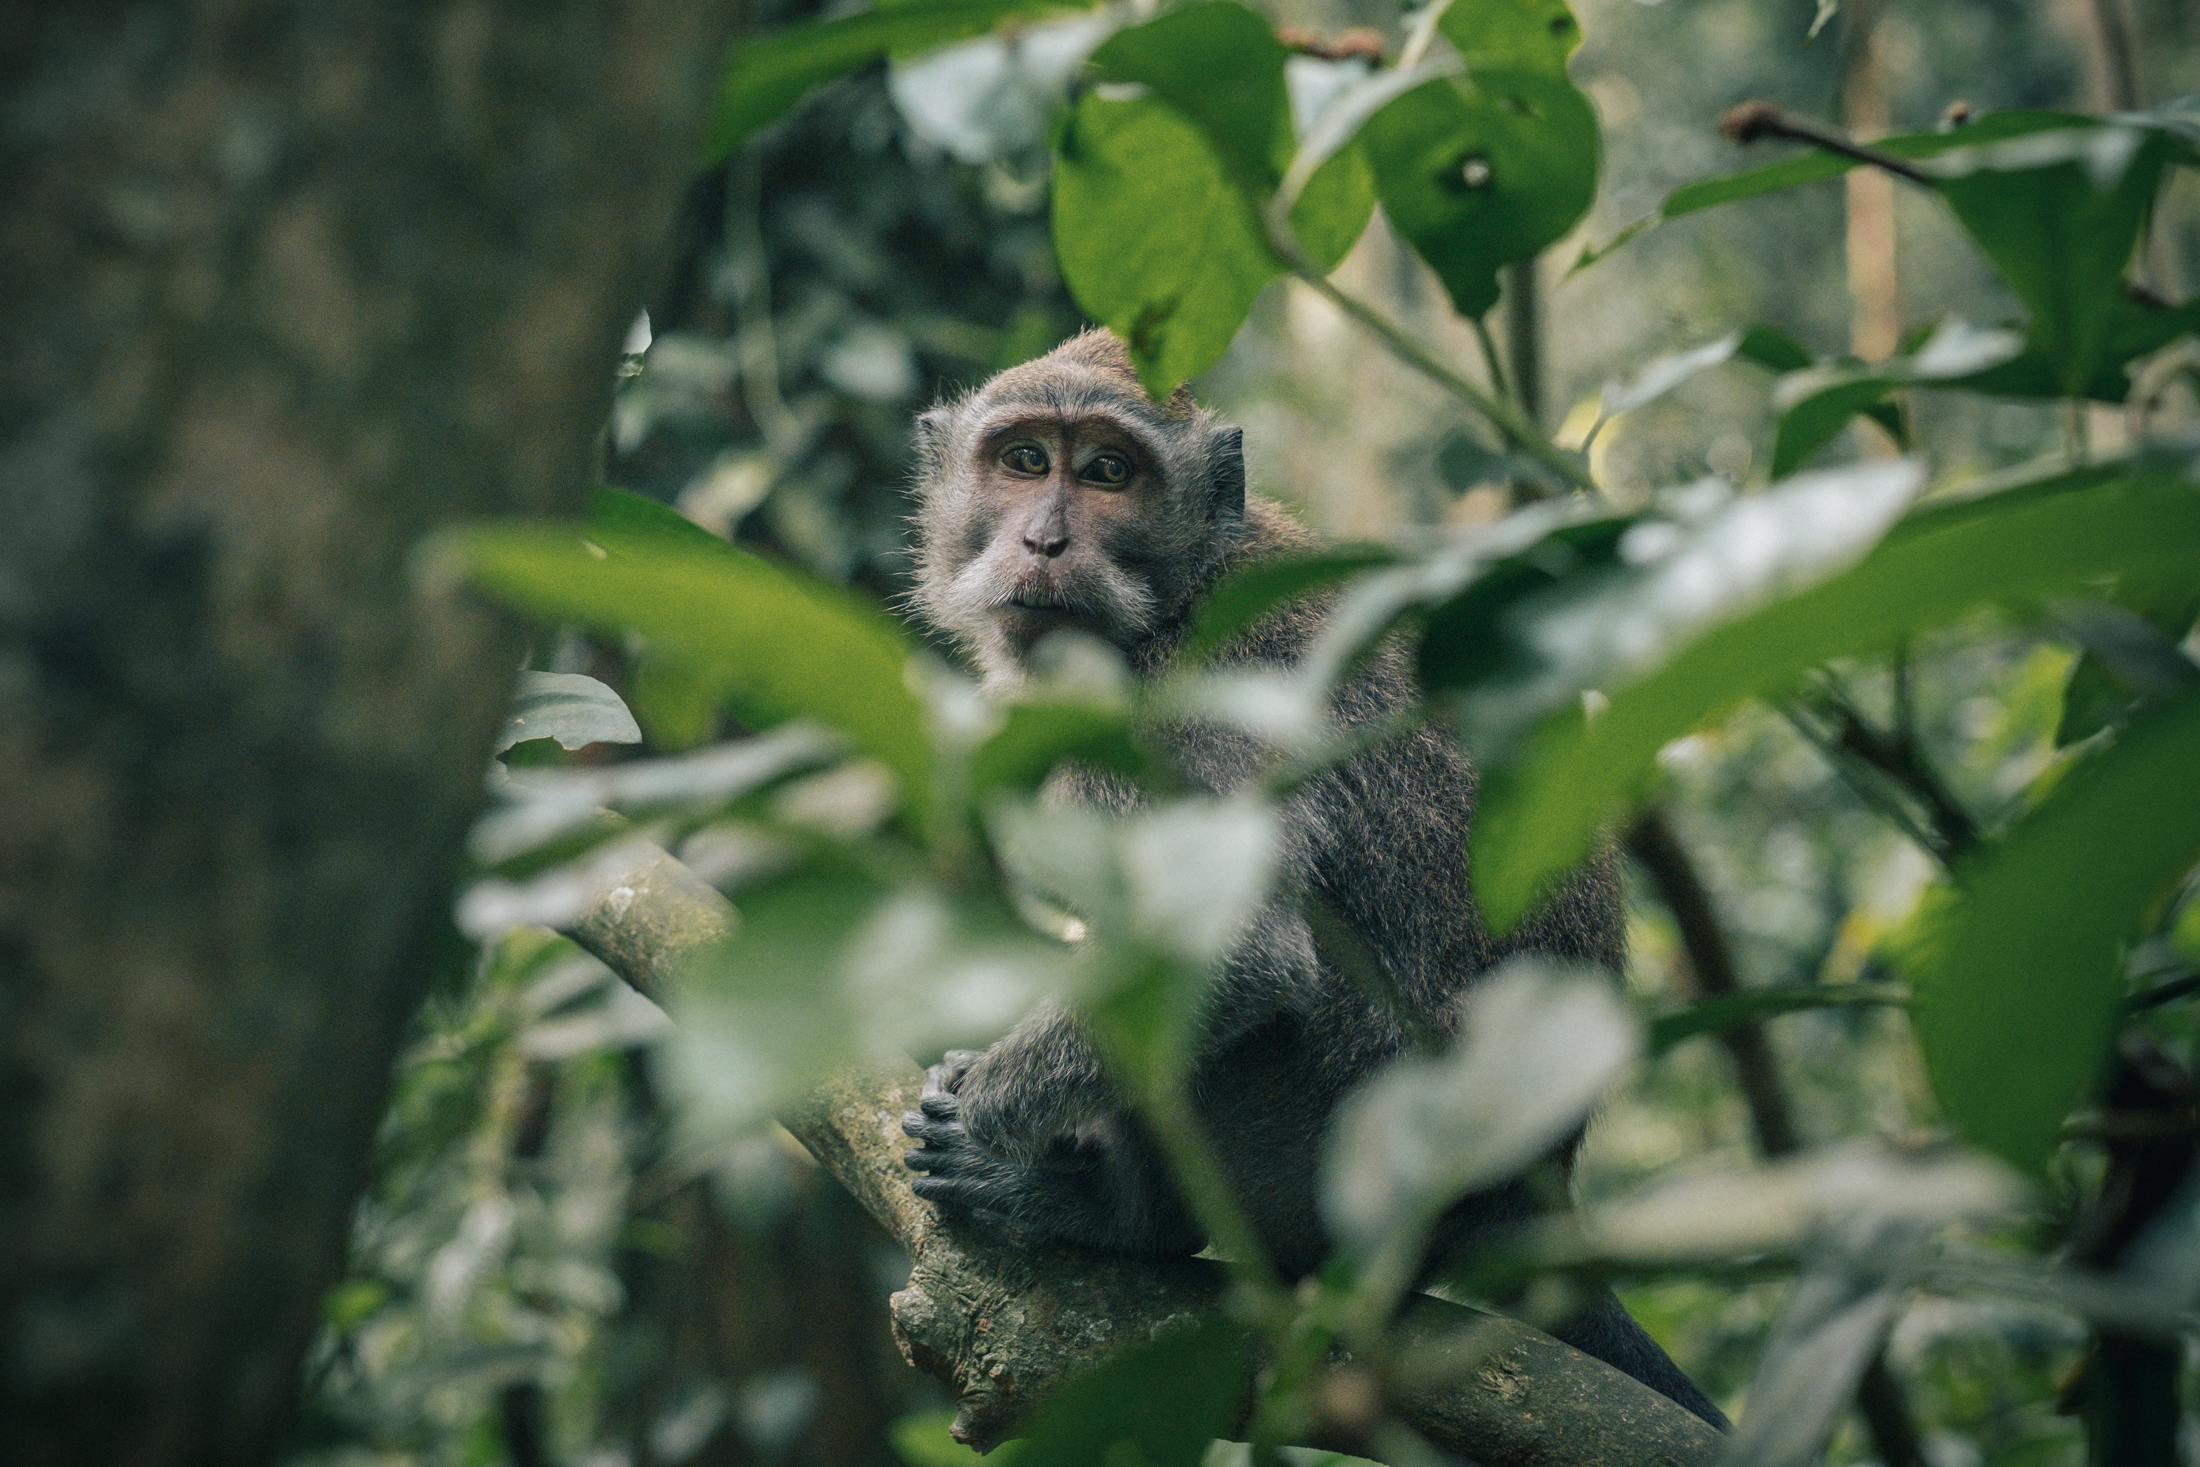 bali_day9_monkey-22.jpg